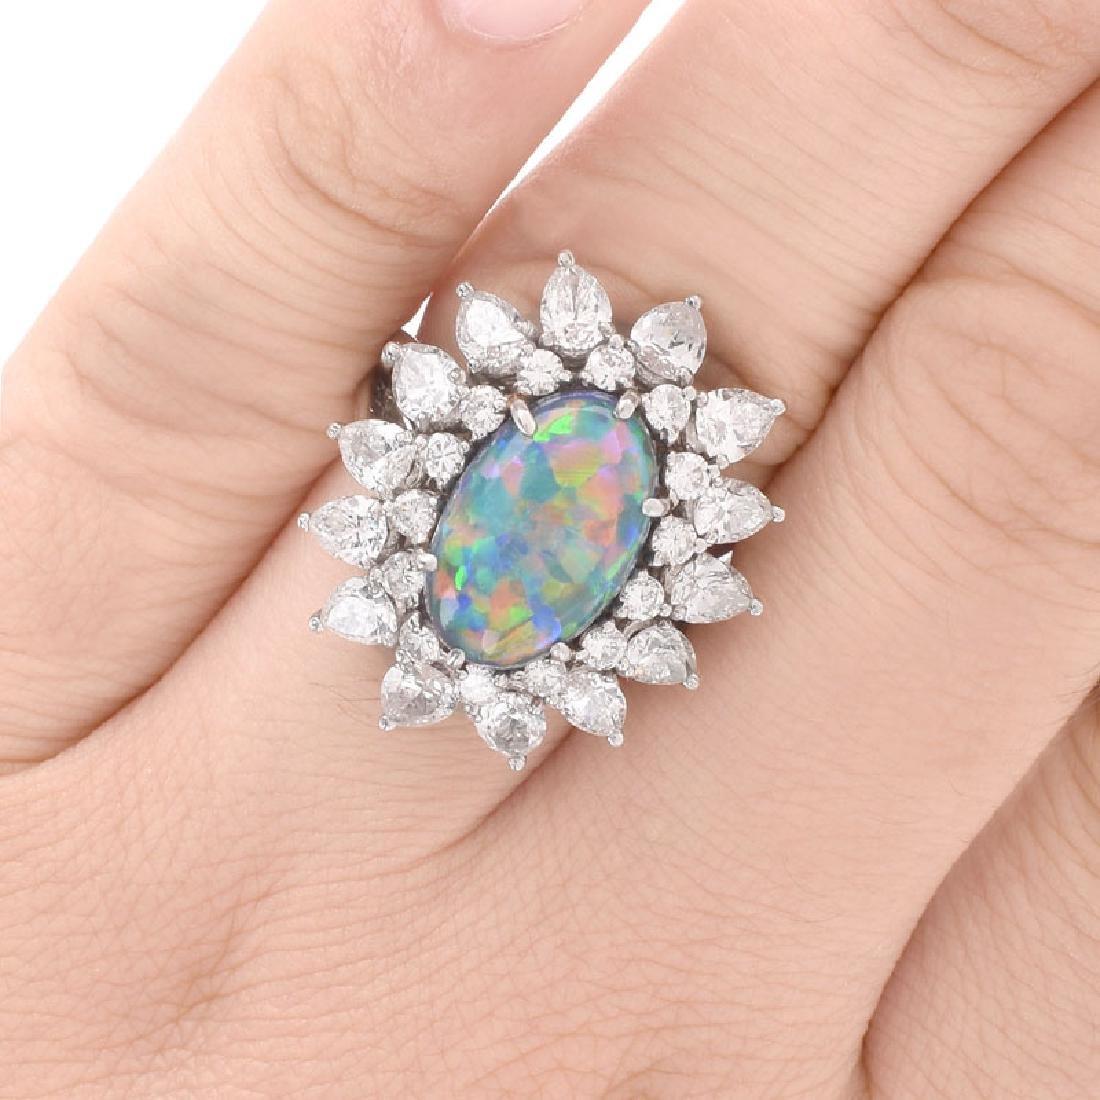 Vintage Tiffany & Co Oval Cabochon Black Opal, Pear - 7